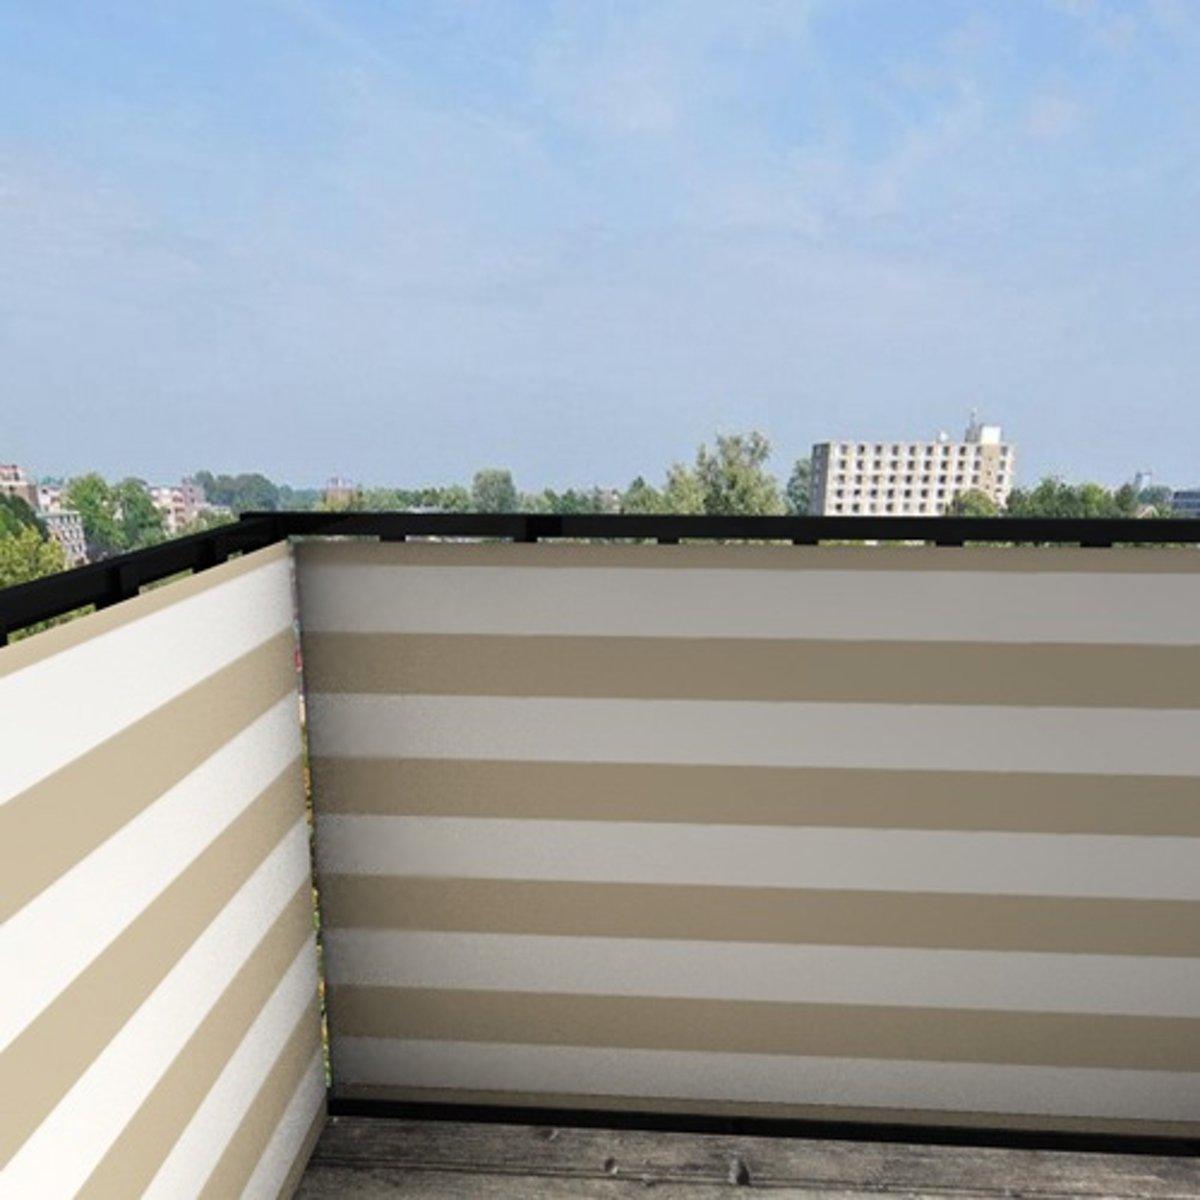 Balkonafscheiding gestreept beige (100x150cm Dubbelzijdig)